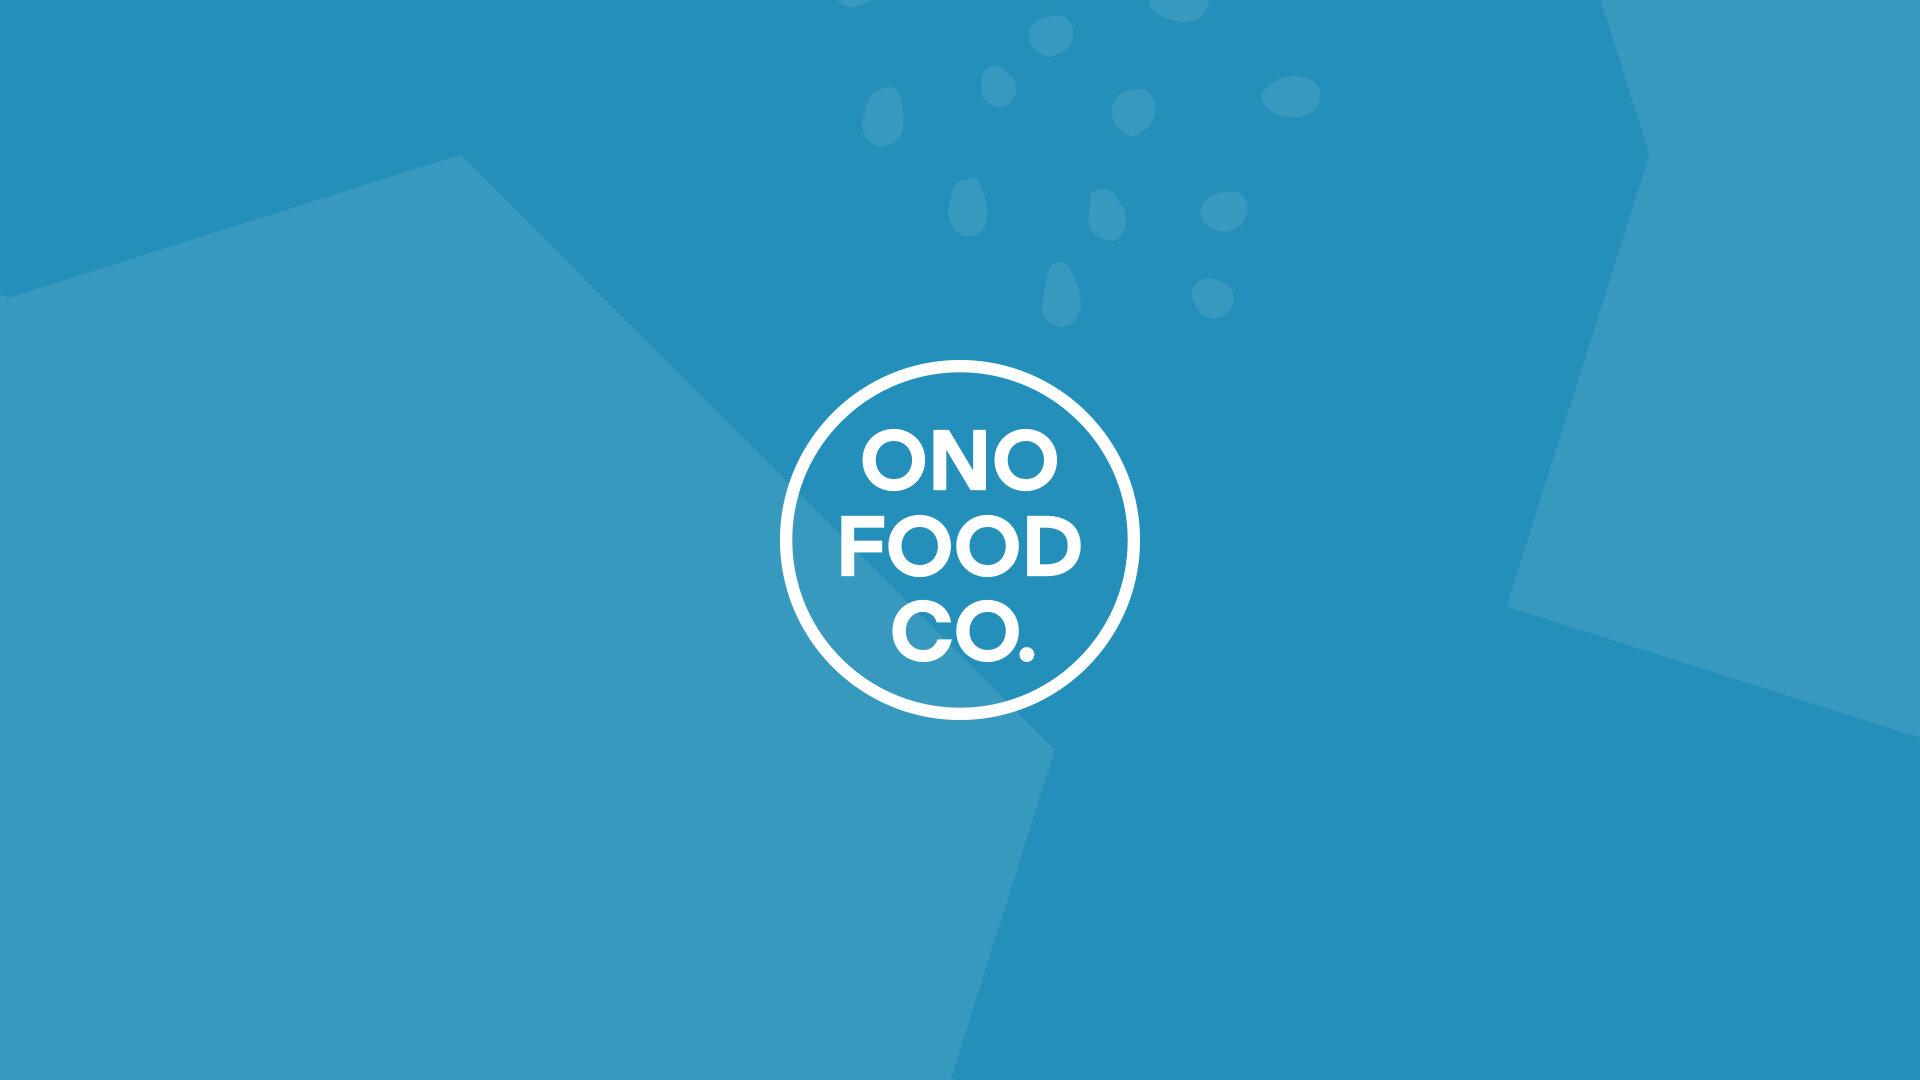 ONO-Logo-FoodCo.jpg